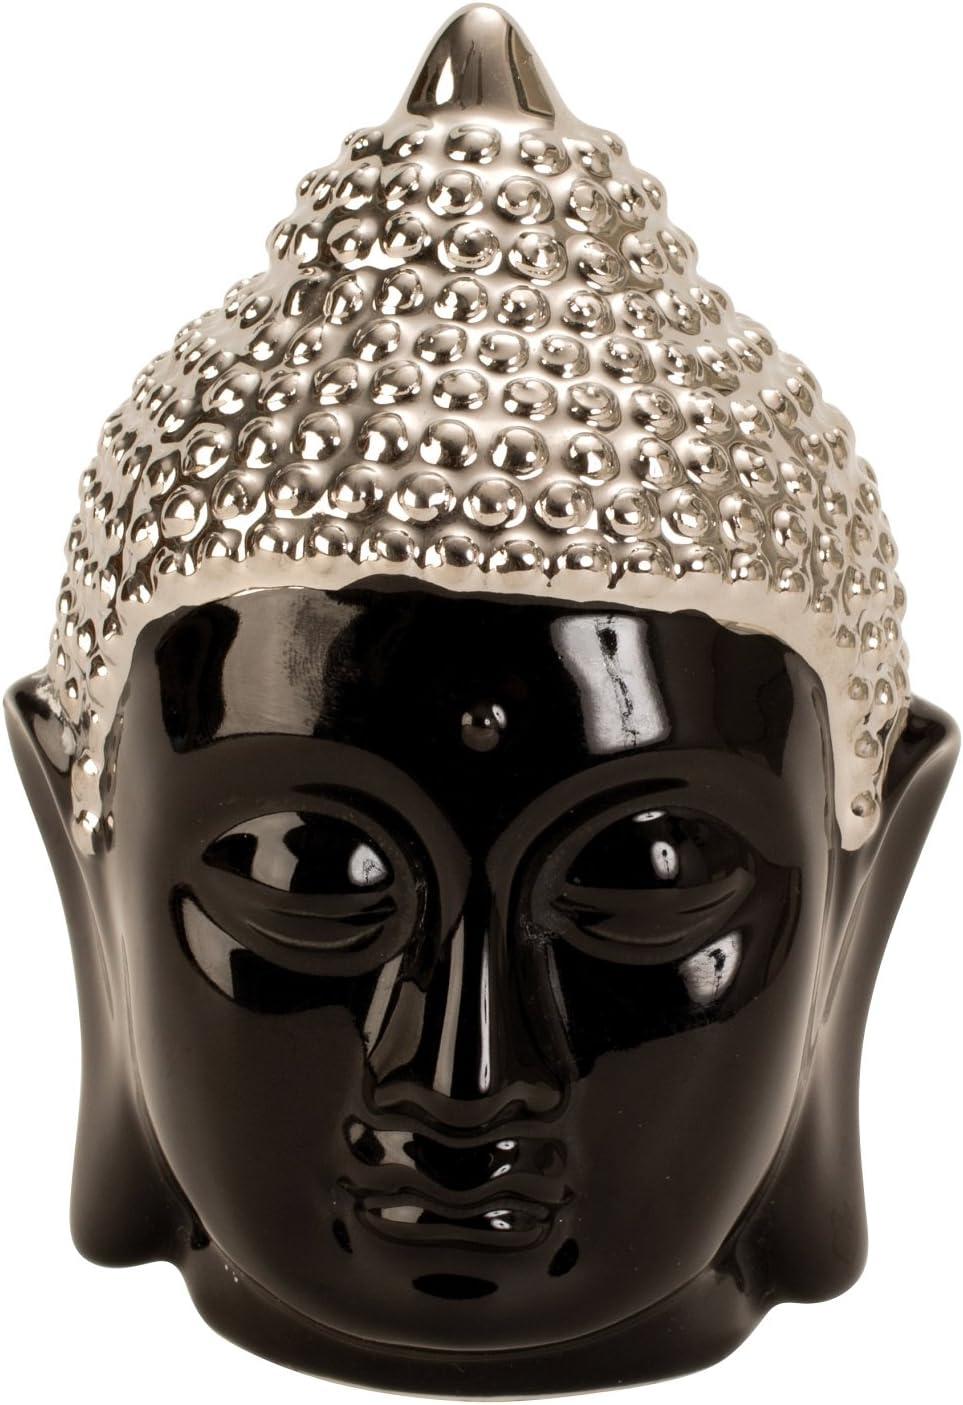 Scultura moderna Testa di Buddha in porcellana nera argento altezza 13,5 cm